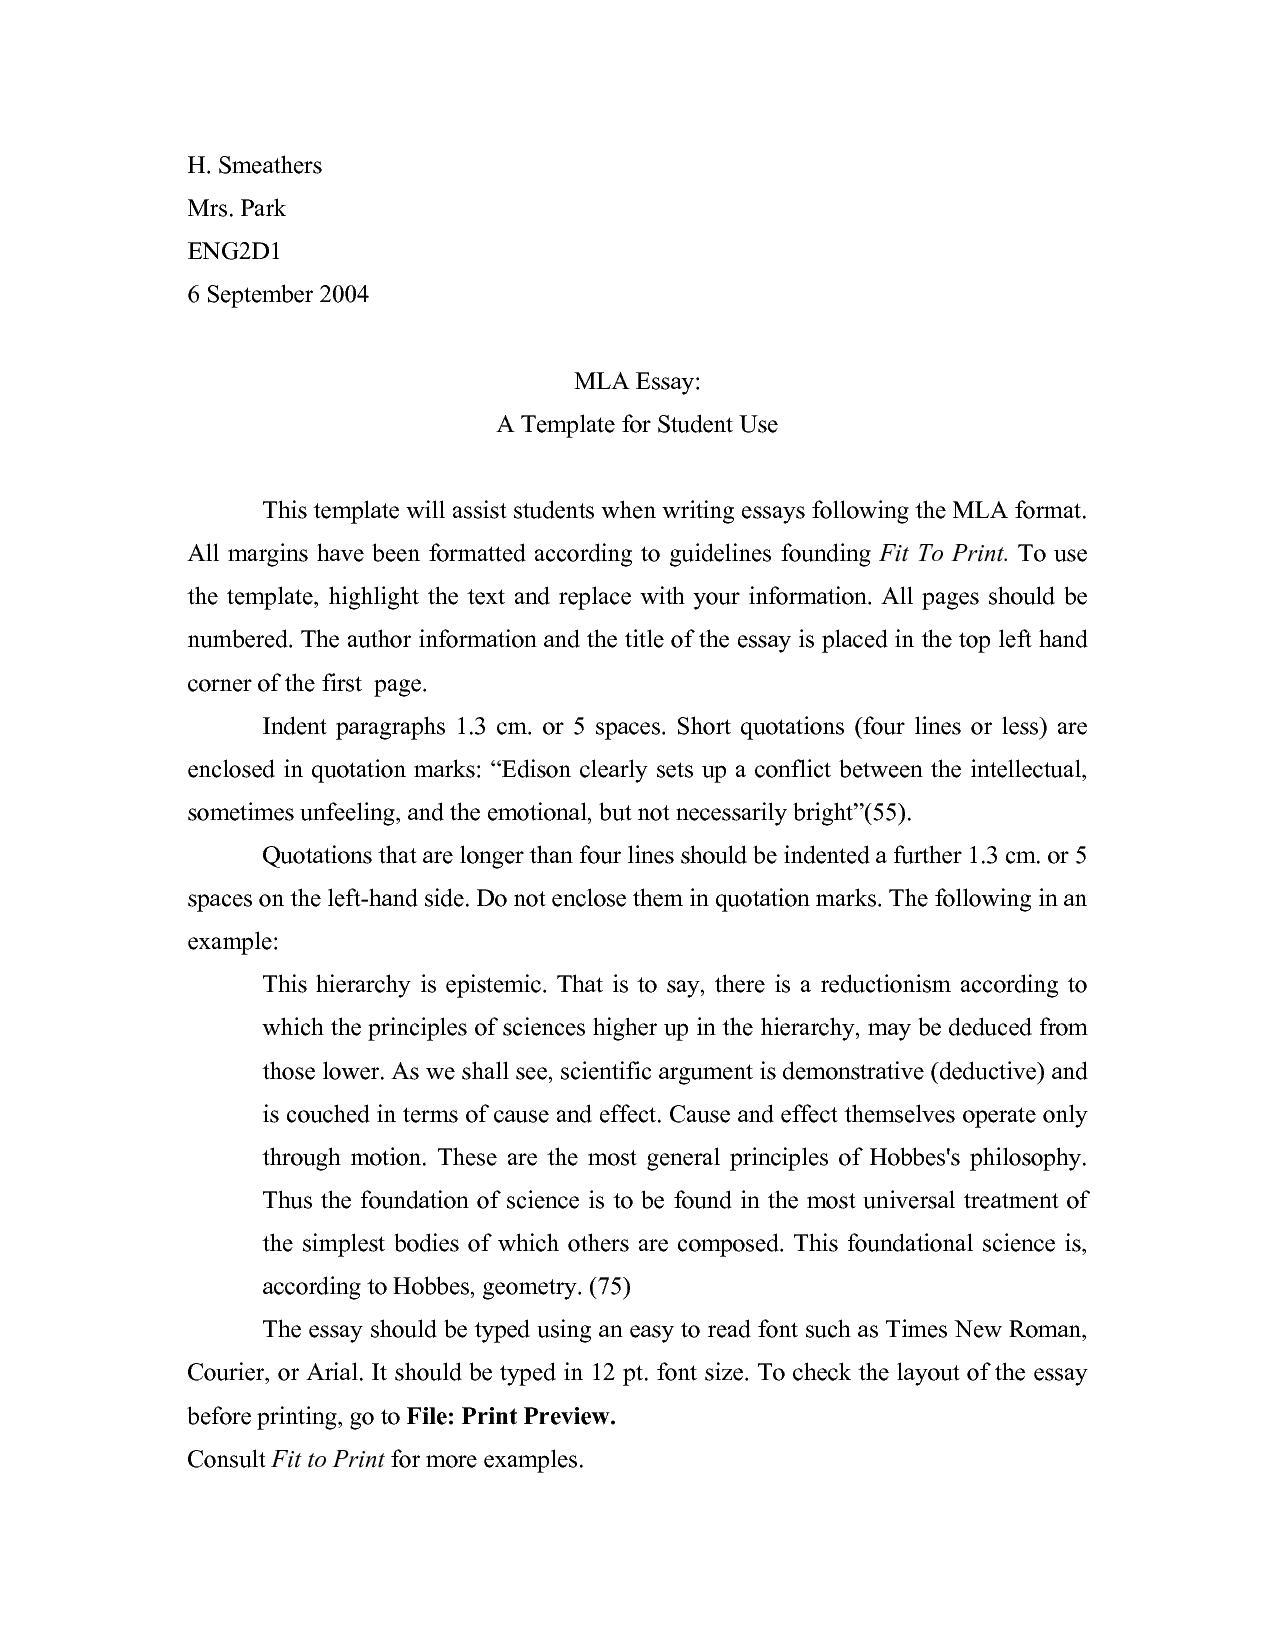 013 Ideas Of Mla Format On Essay Targer Golden Dragon Wonderful College Sample Beautiful Example 2017 Comparison Narrative Full